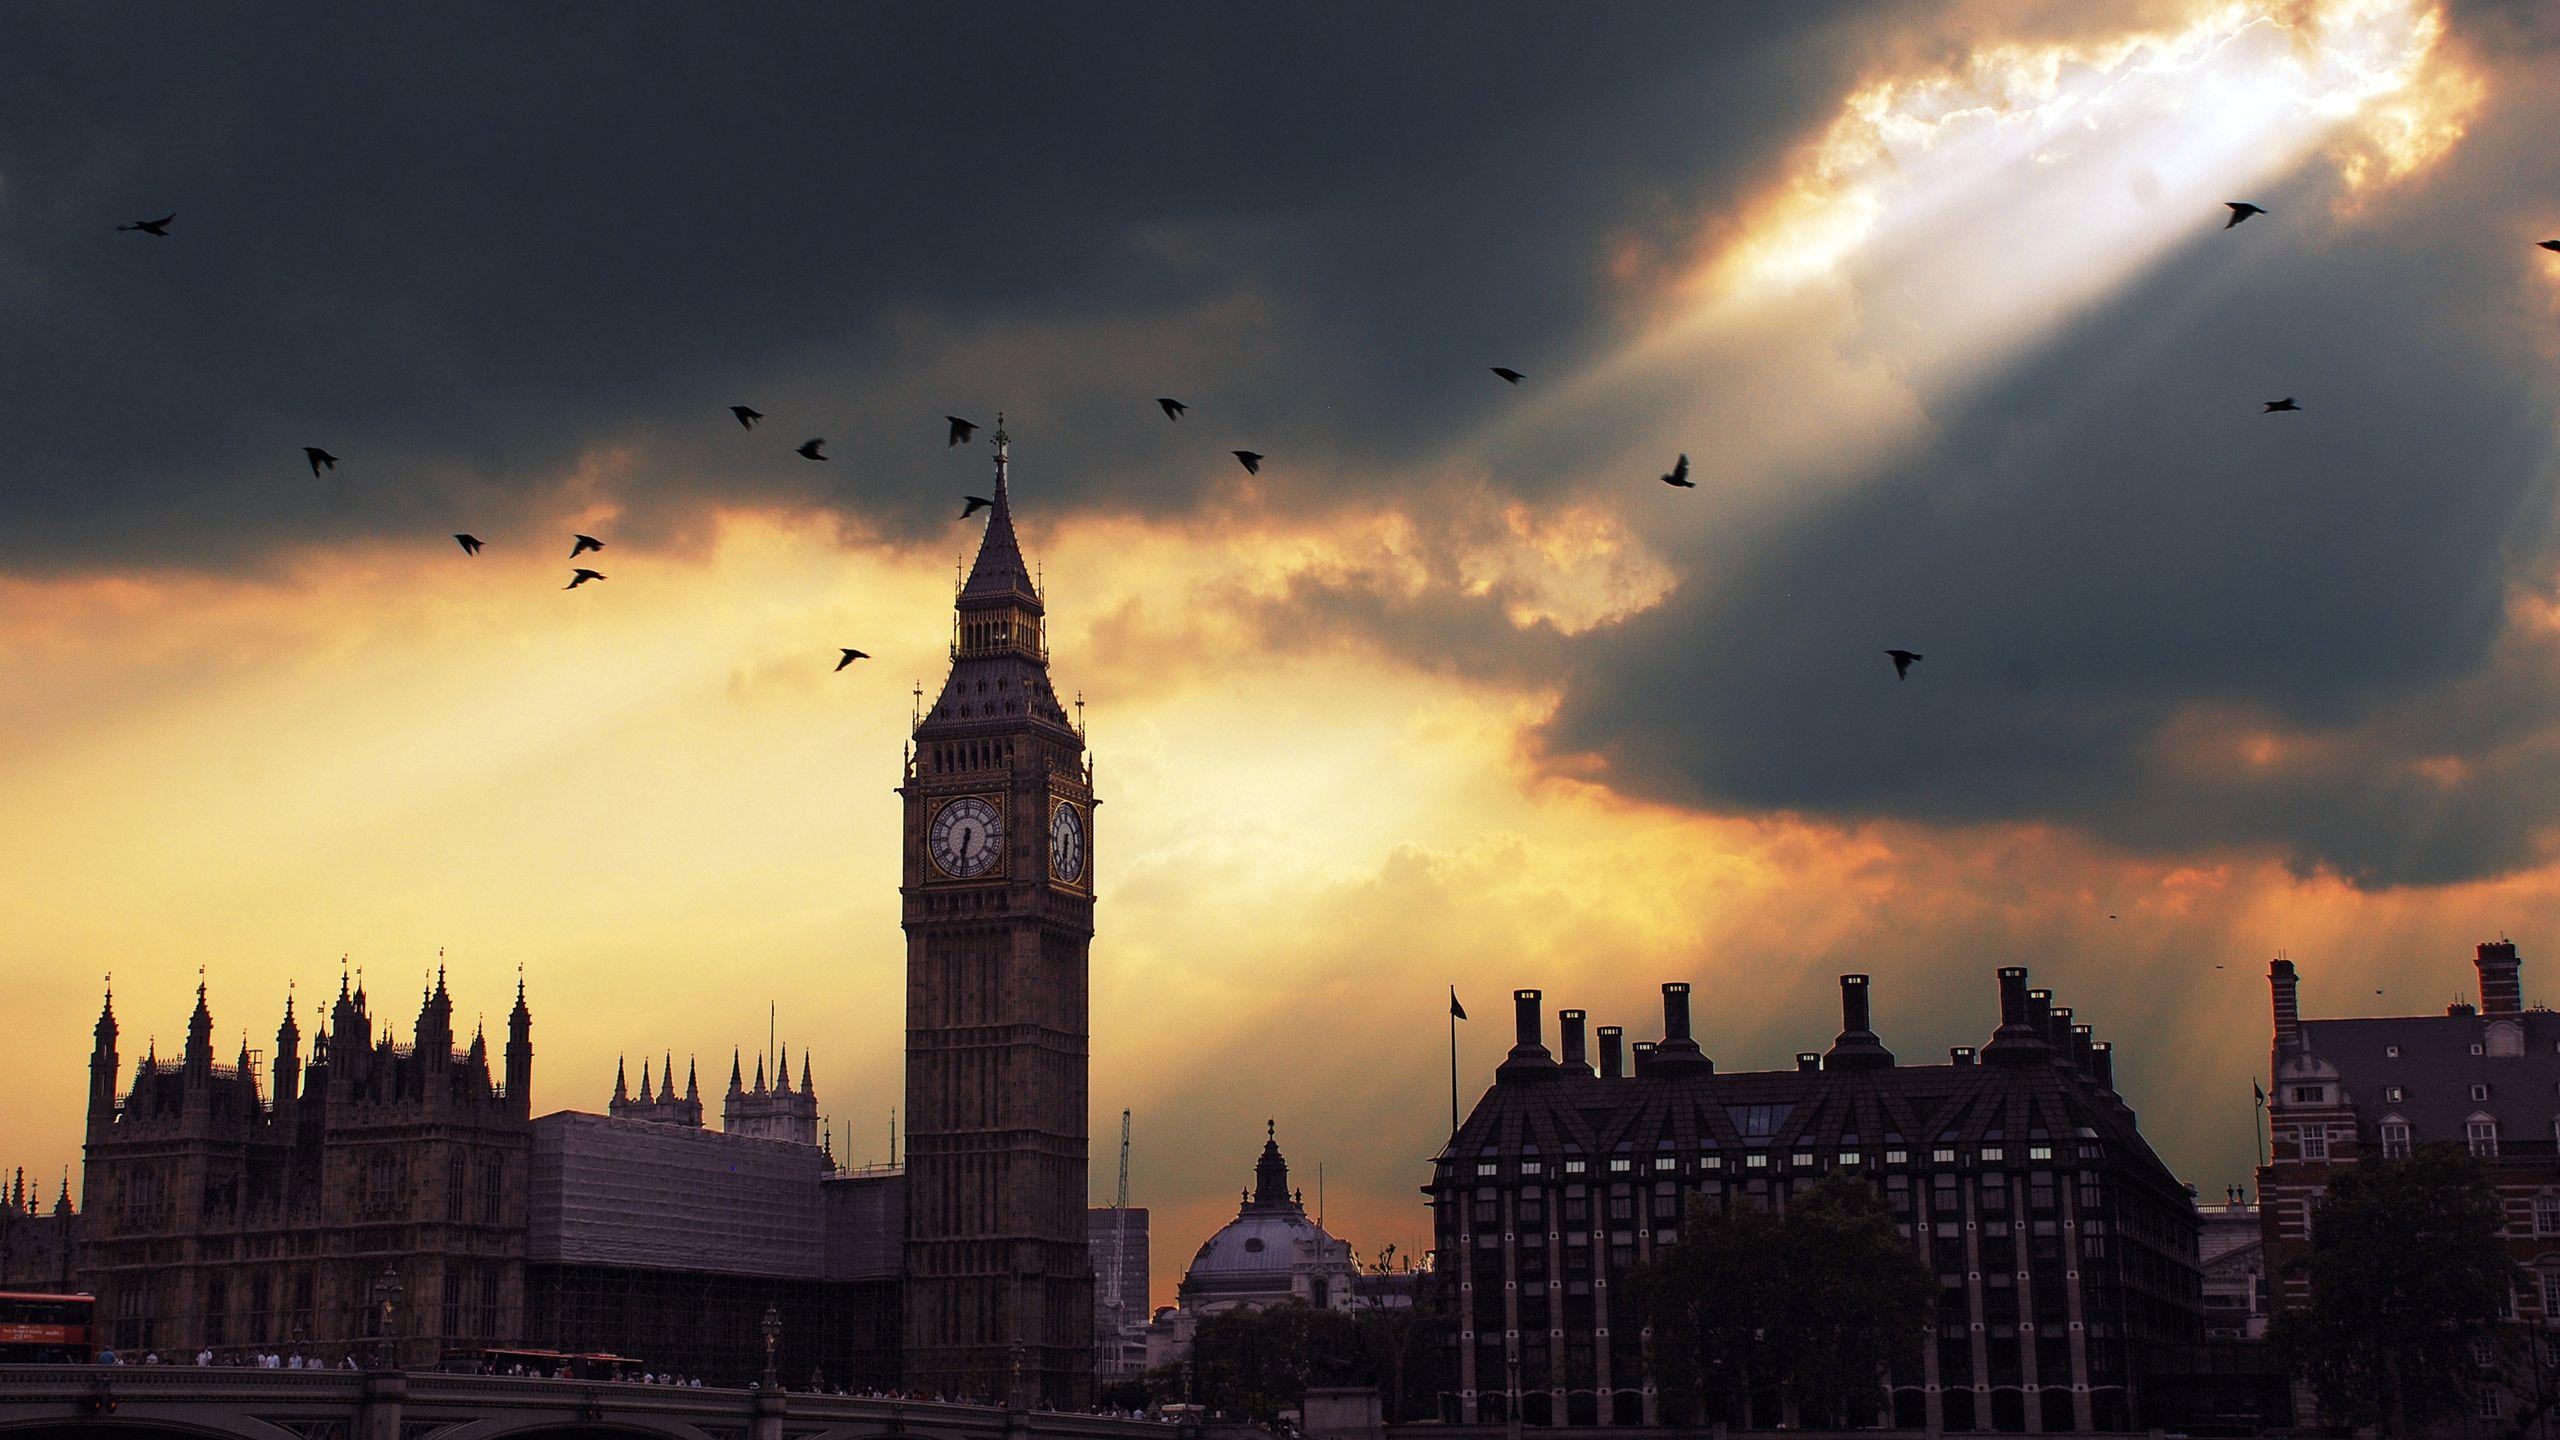 2560x1440 Wallpaper london, big ben, sunset, shadow, sky